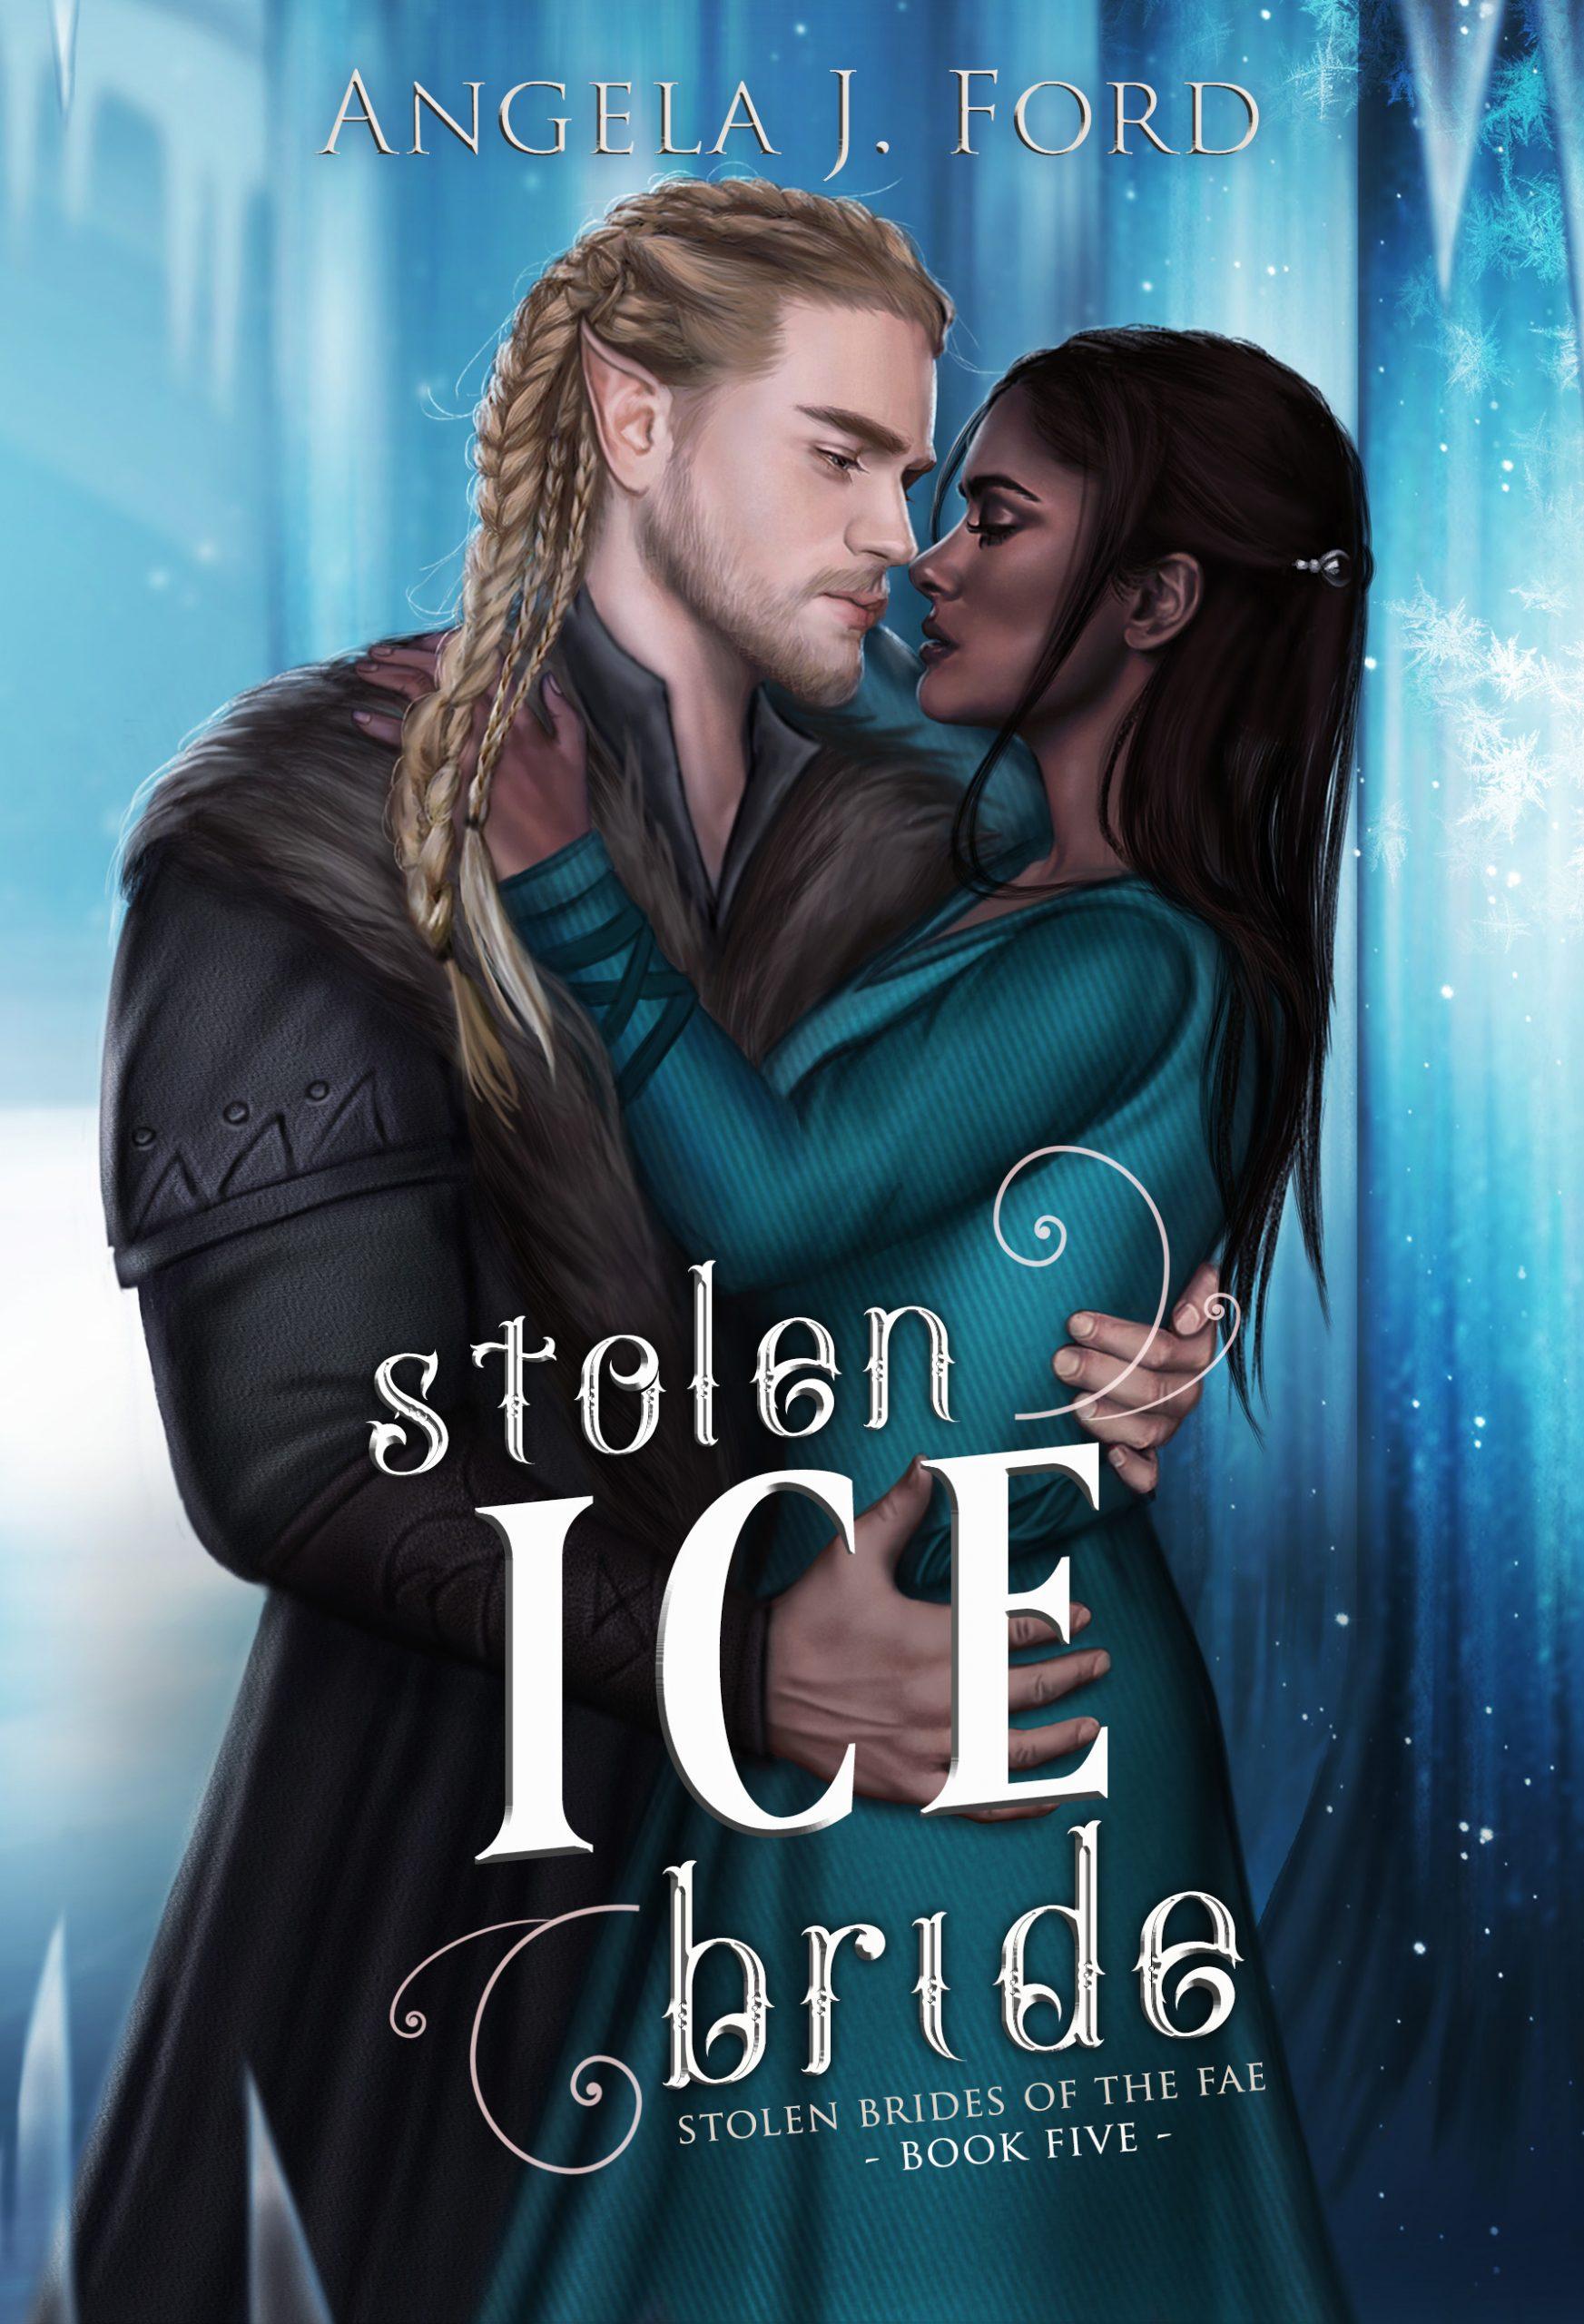 Stolen Ice Bride